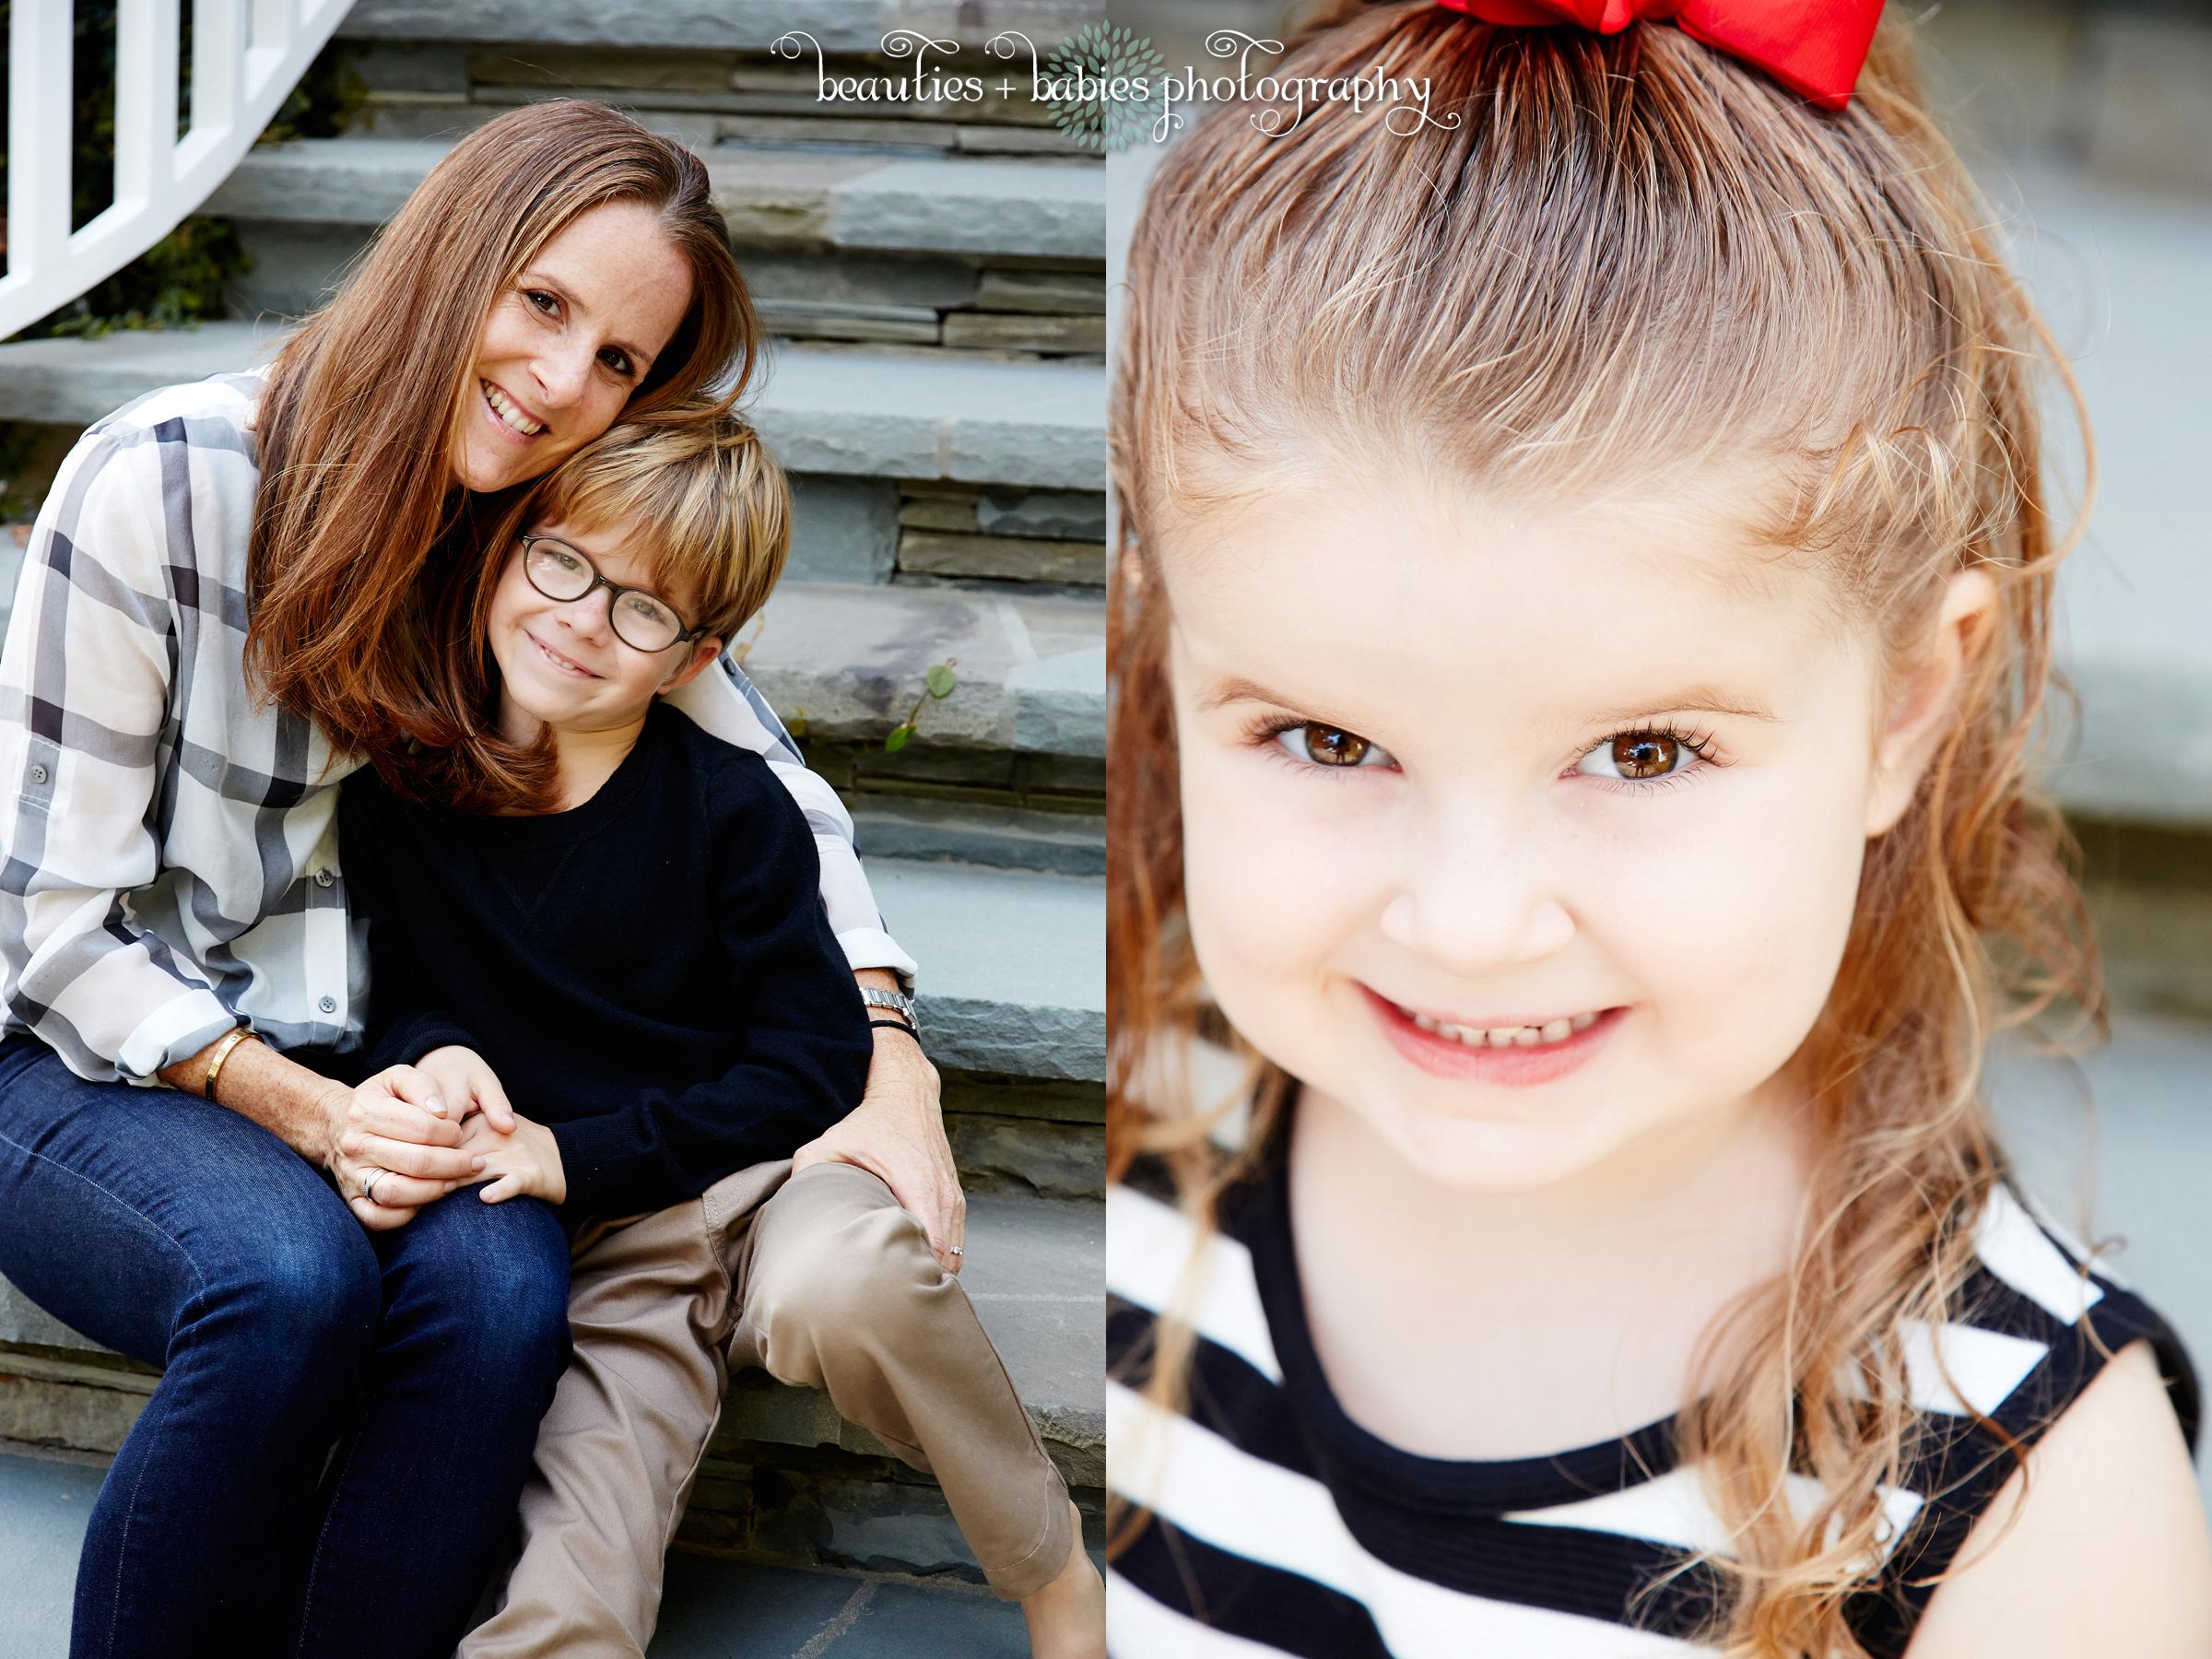 family photography0001